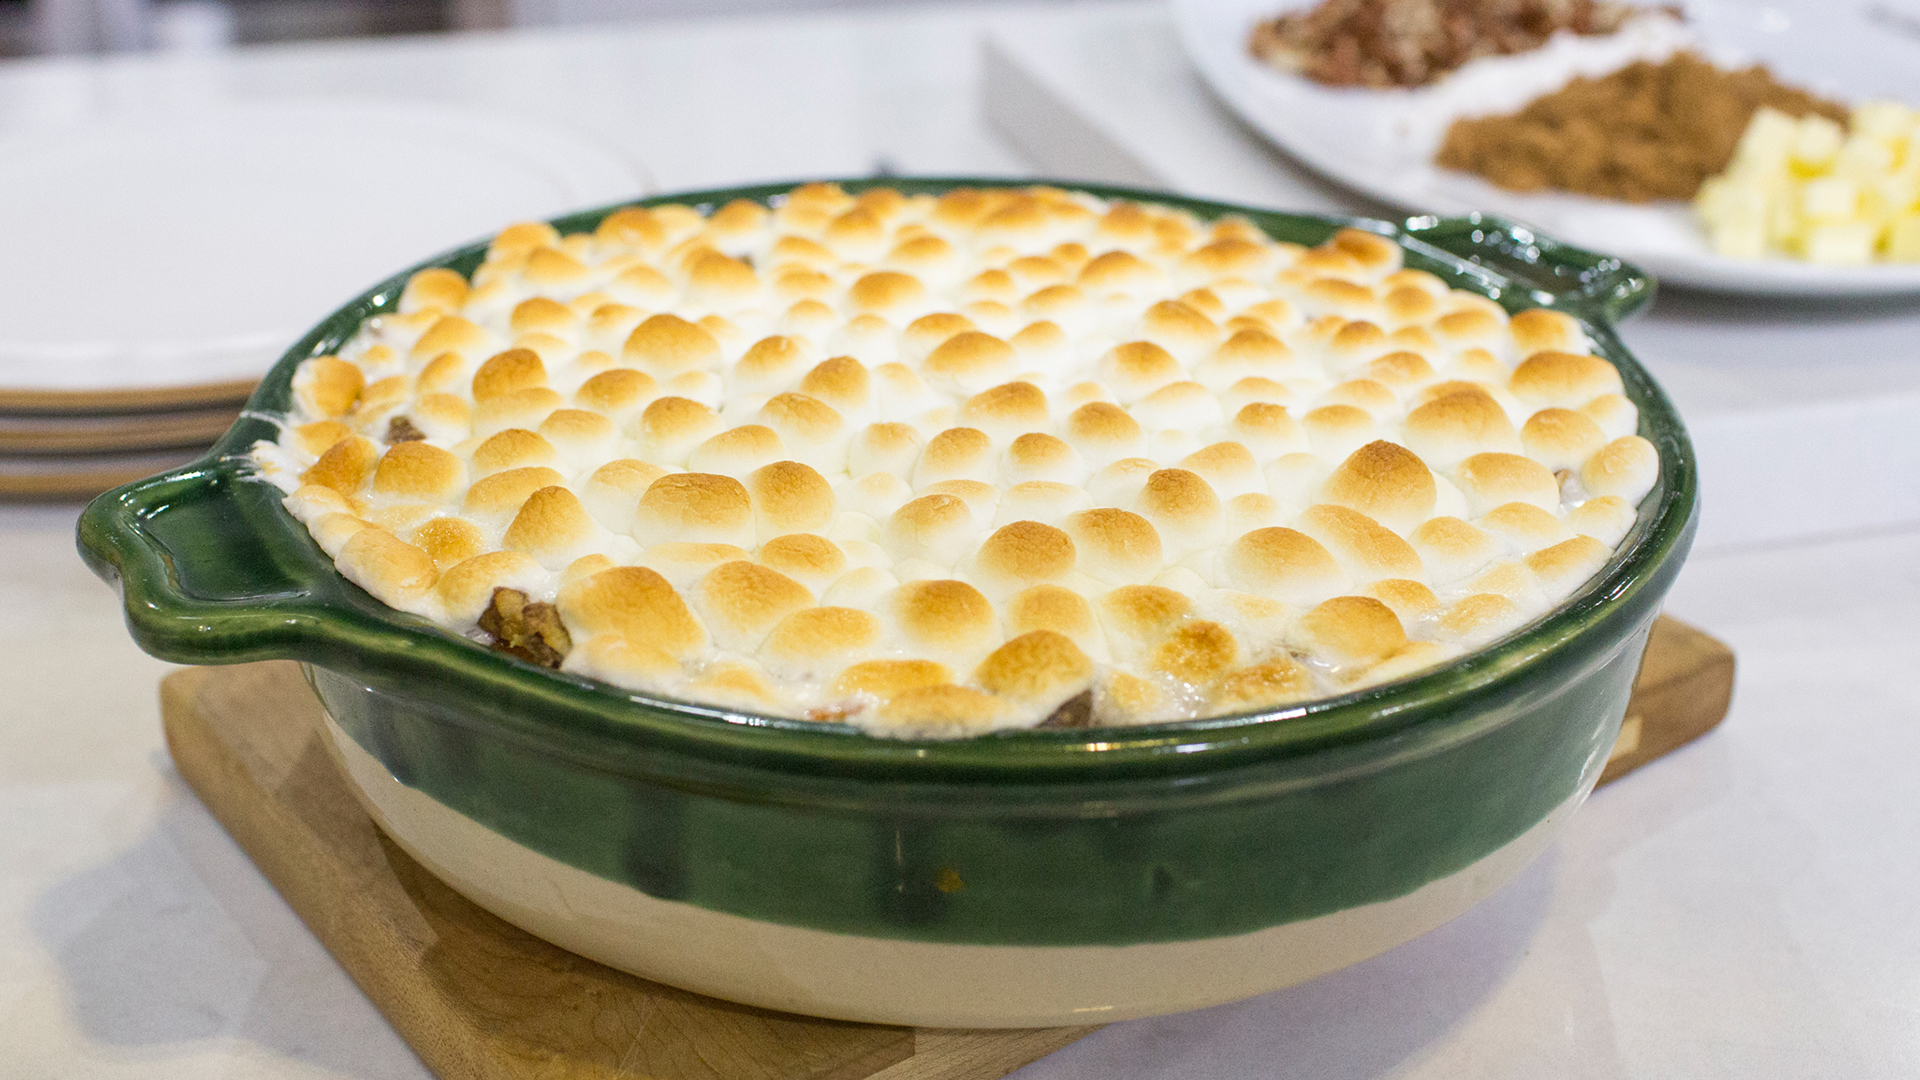 Katie Lee S Sweet Potato Casserole With Mini Marshmallows Today Com